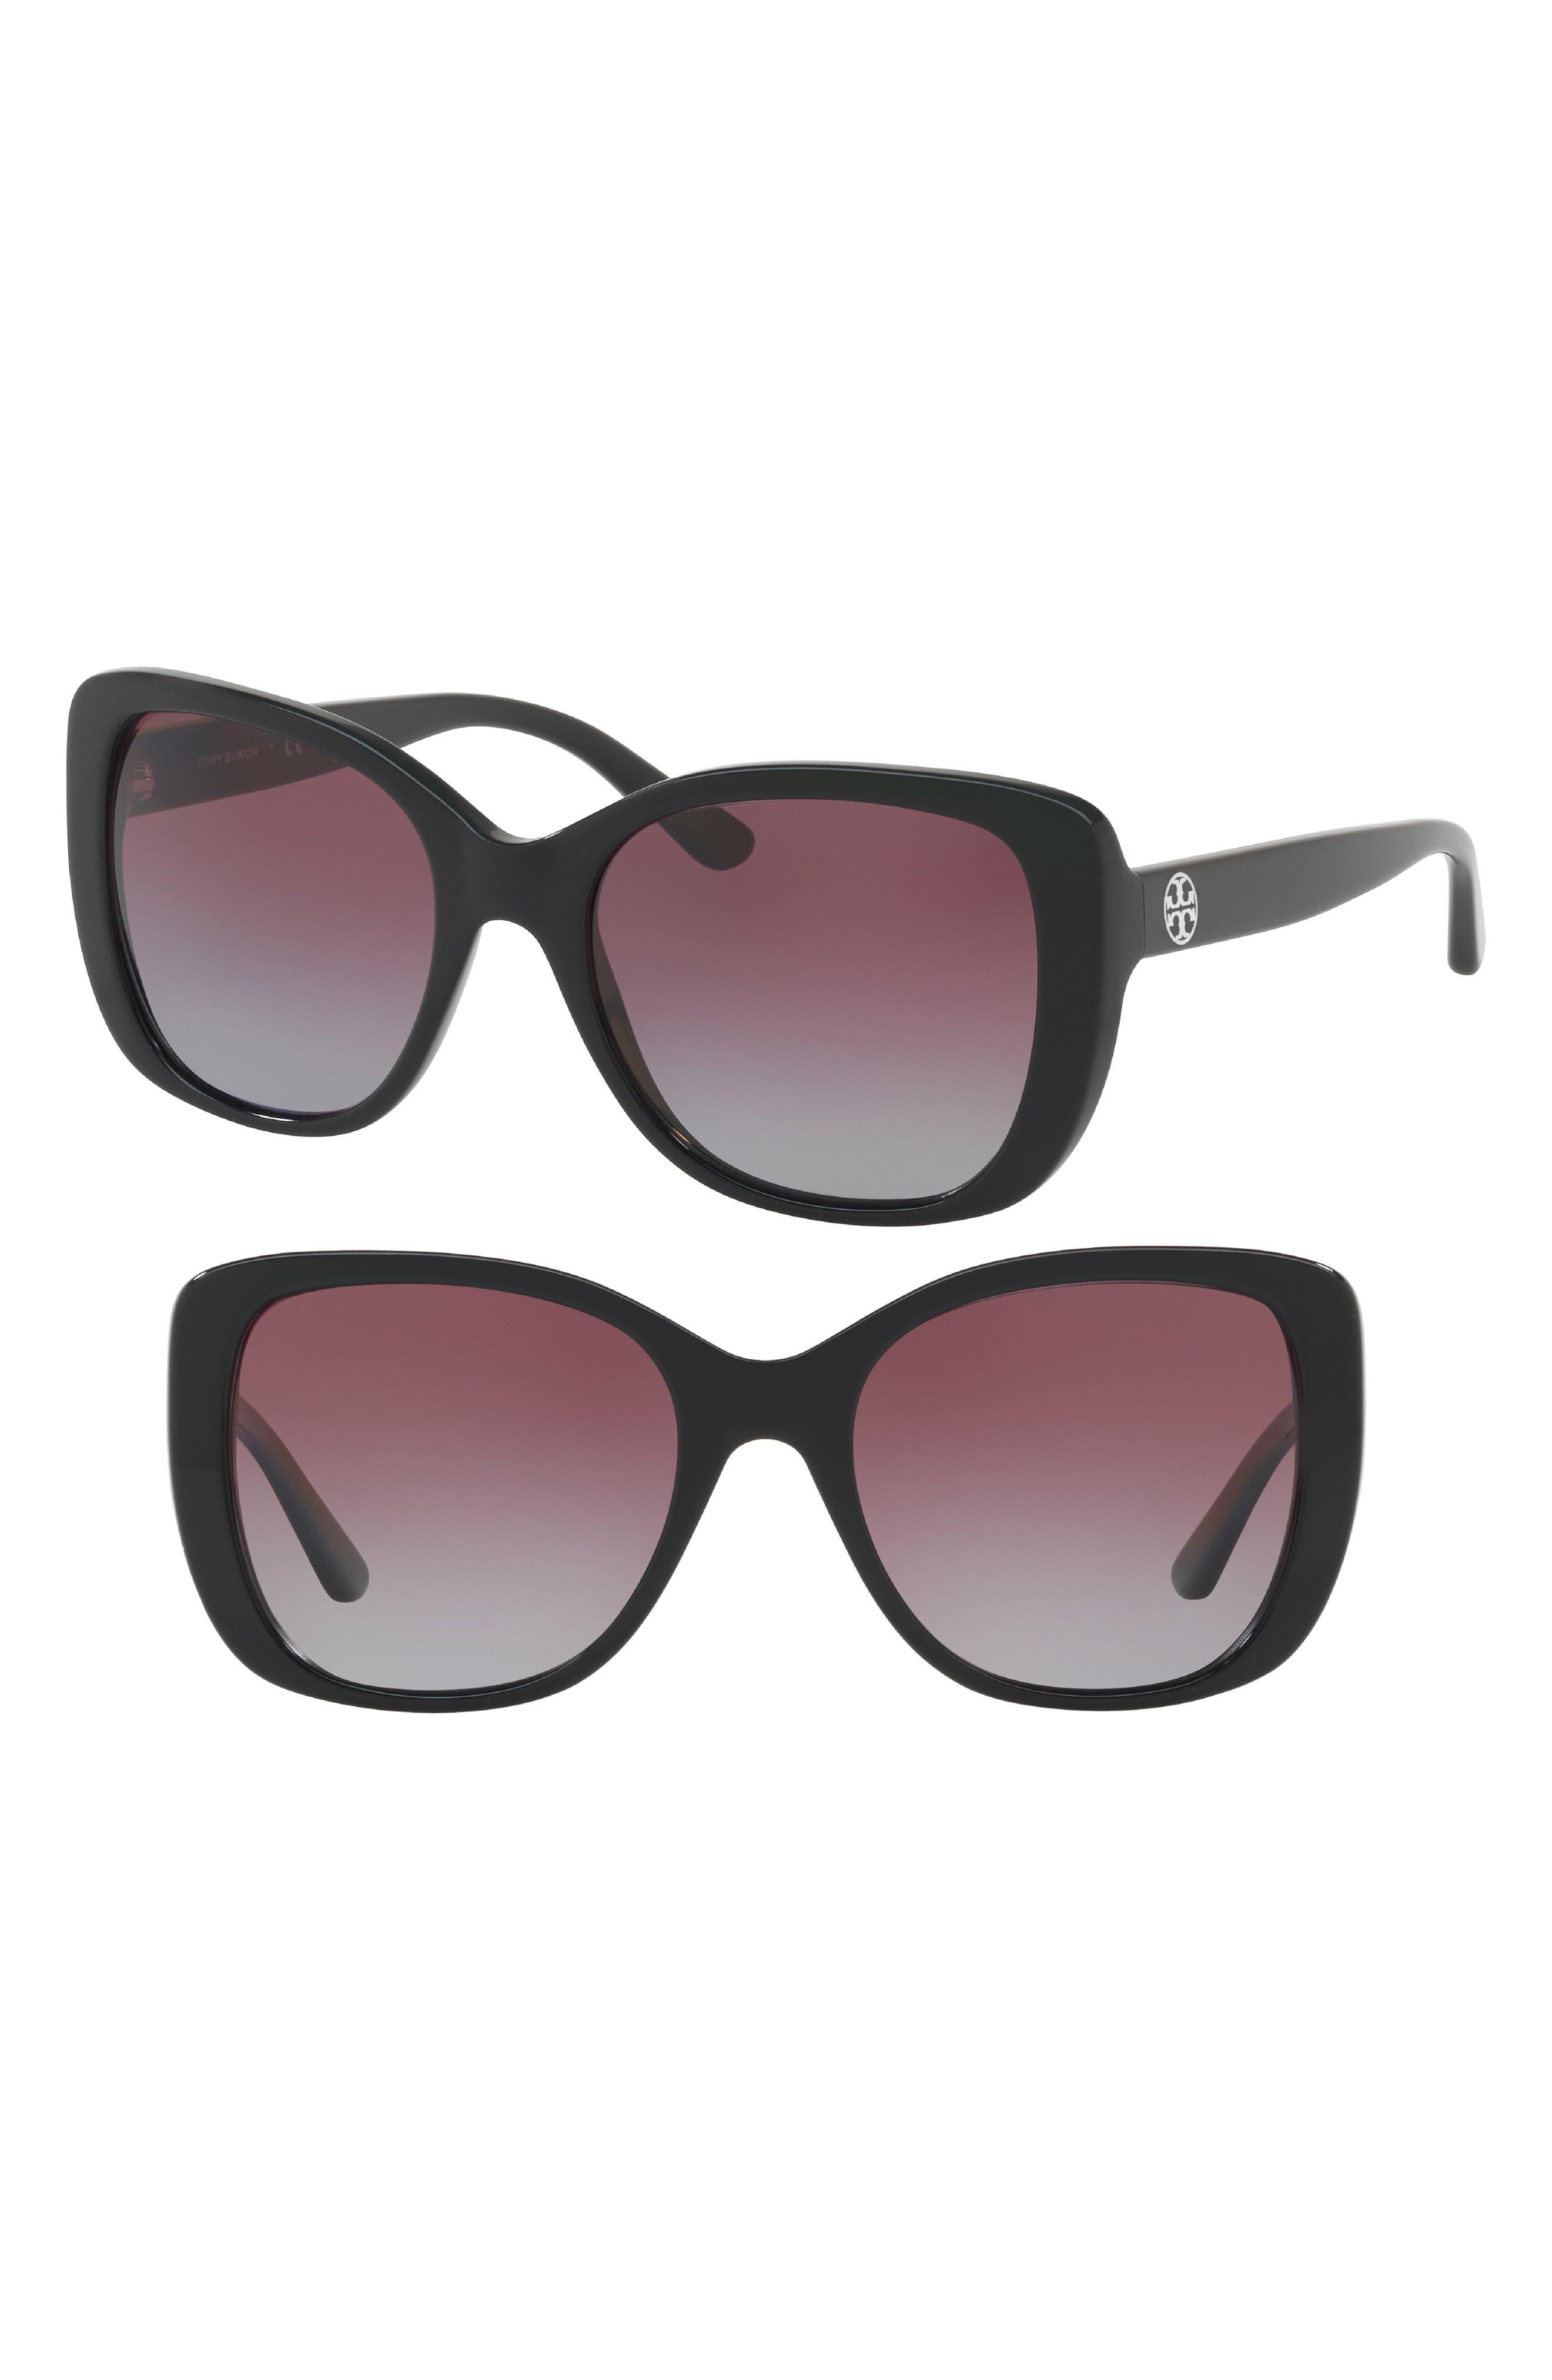 53mm Polarized Rectangle Sunglasses,                             Main thumbnail 1, color,                             008